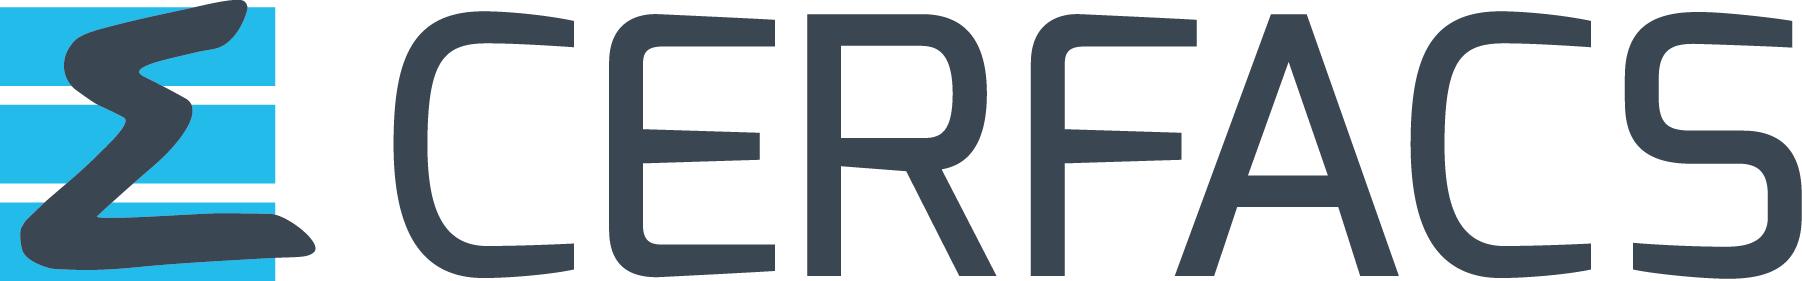 CERFACS (sponsor)